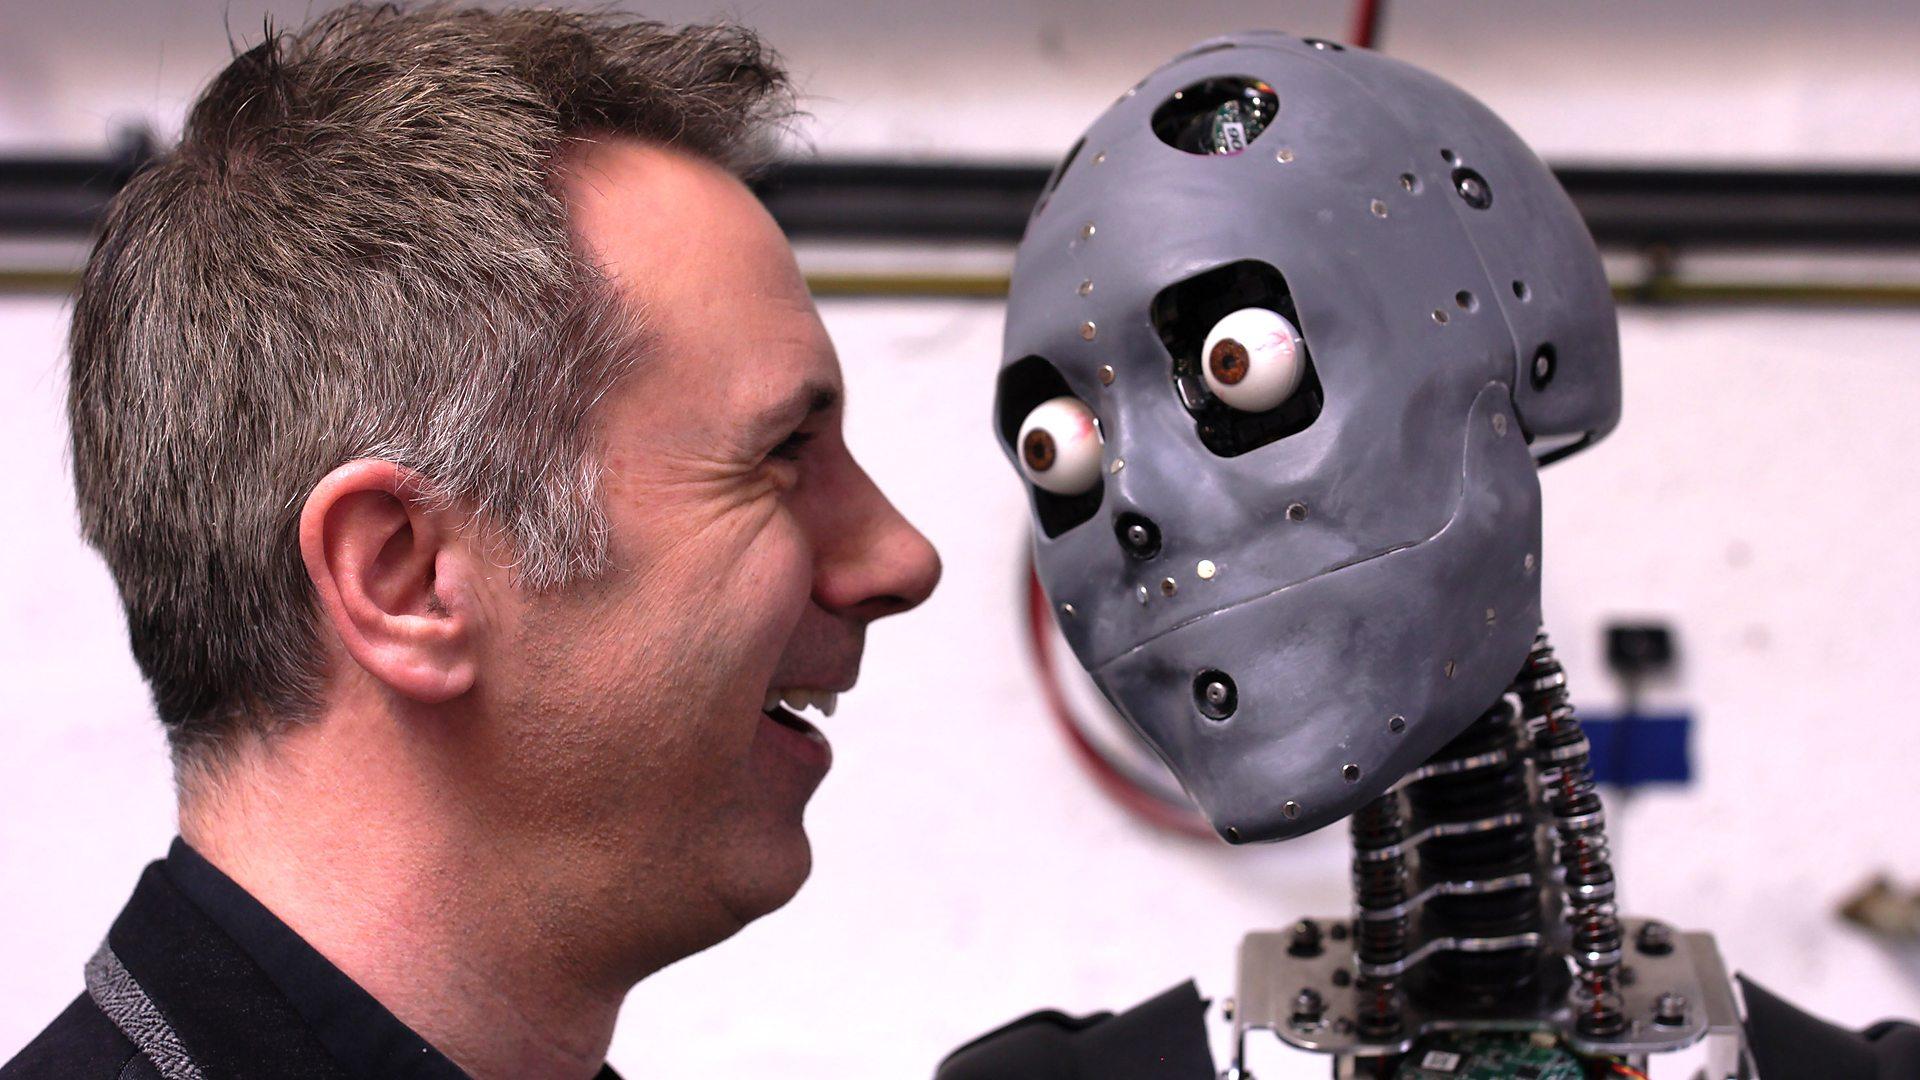 The Future of Humanoid Robots?